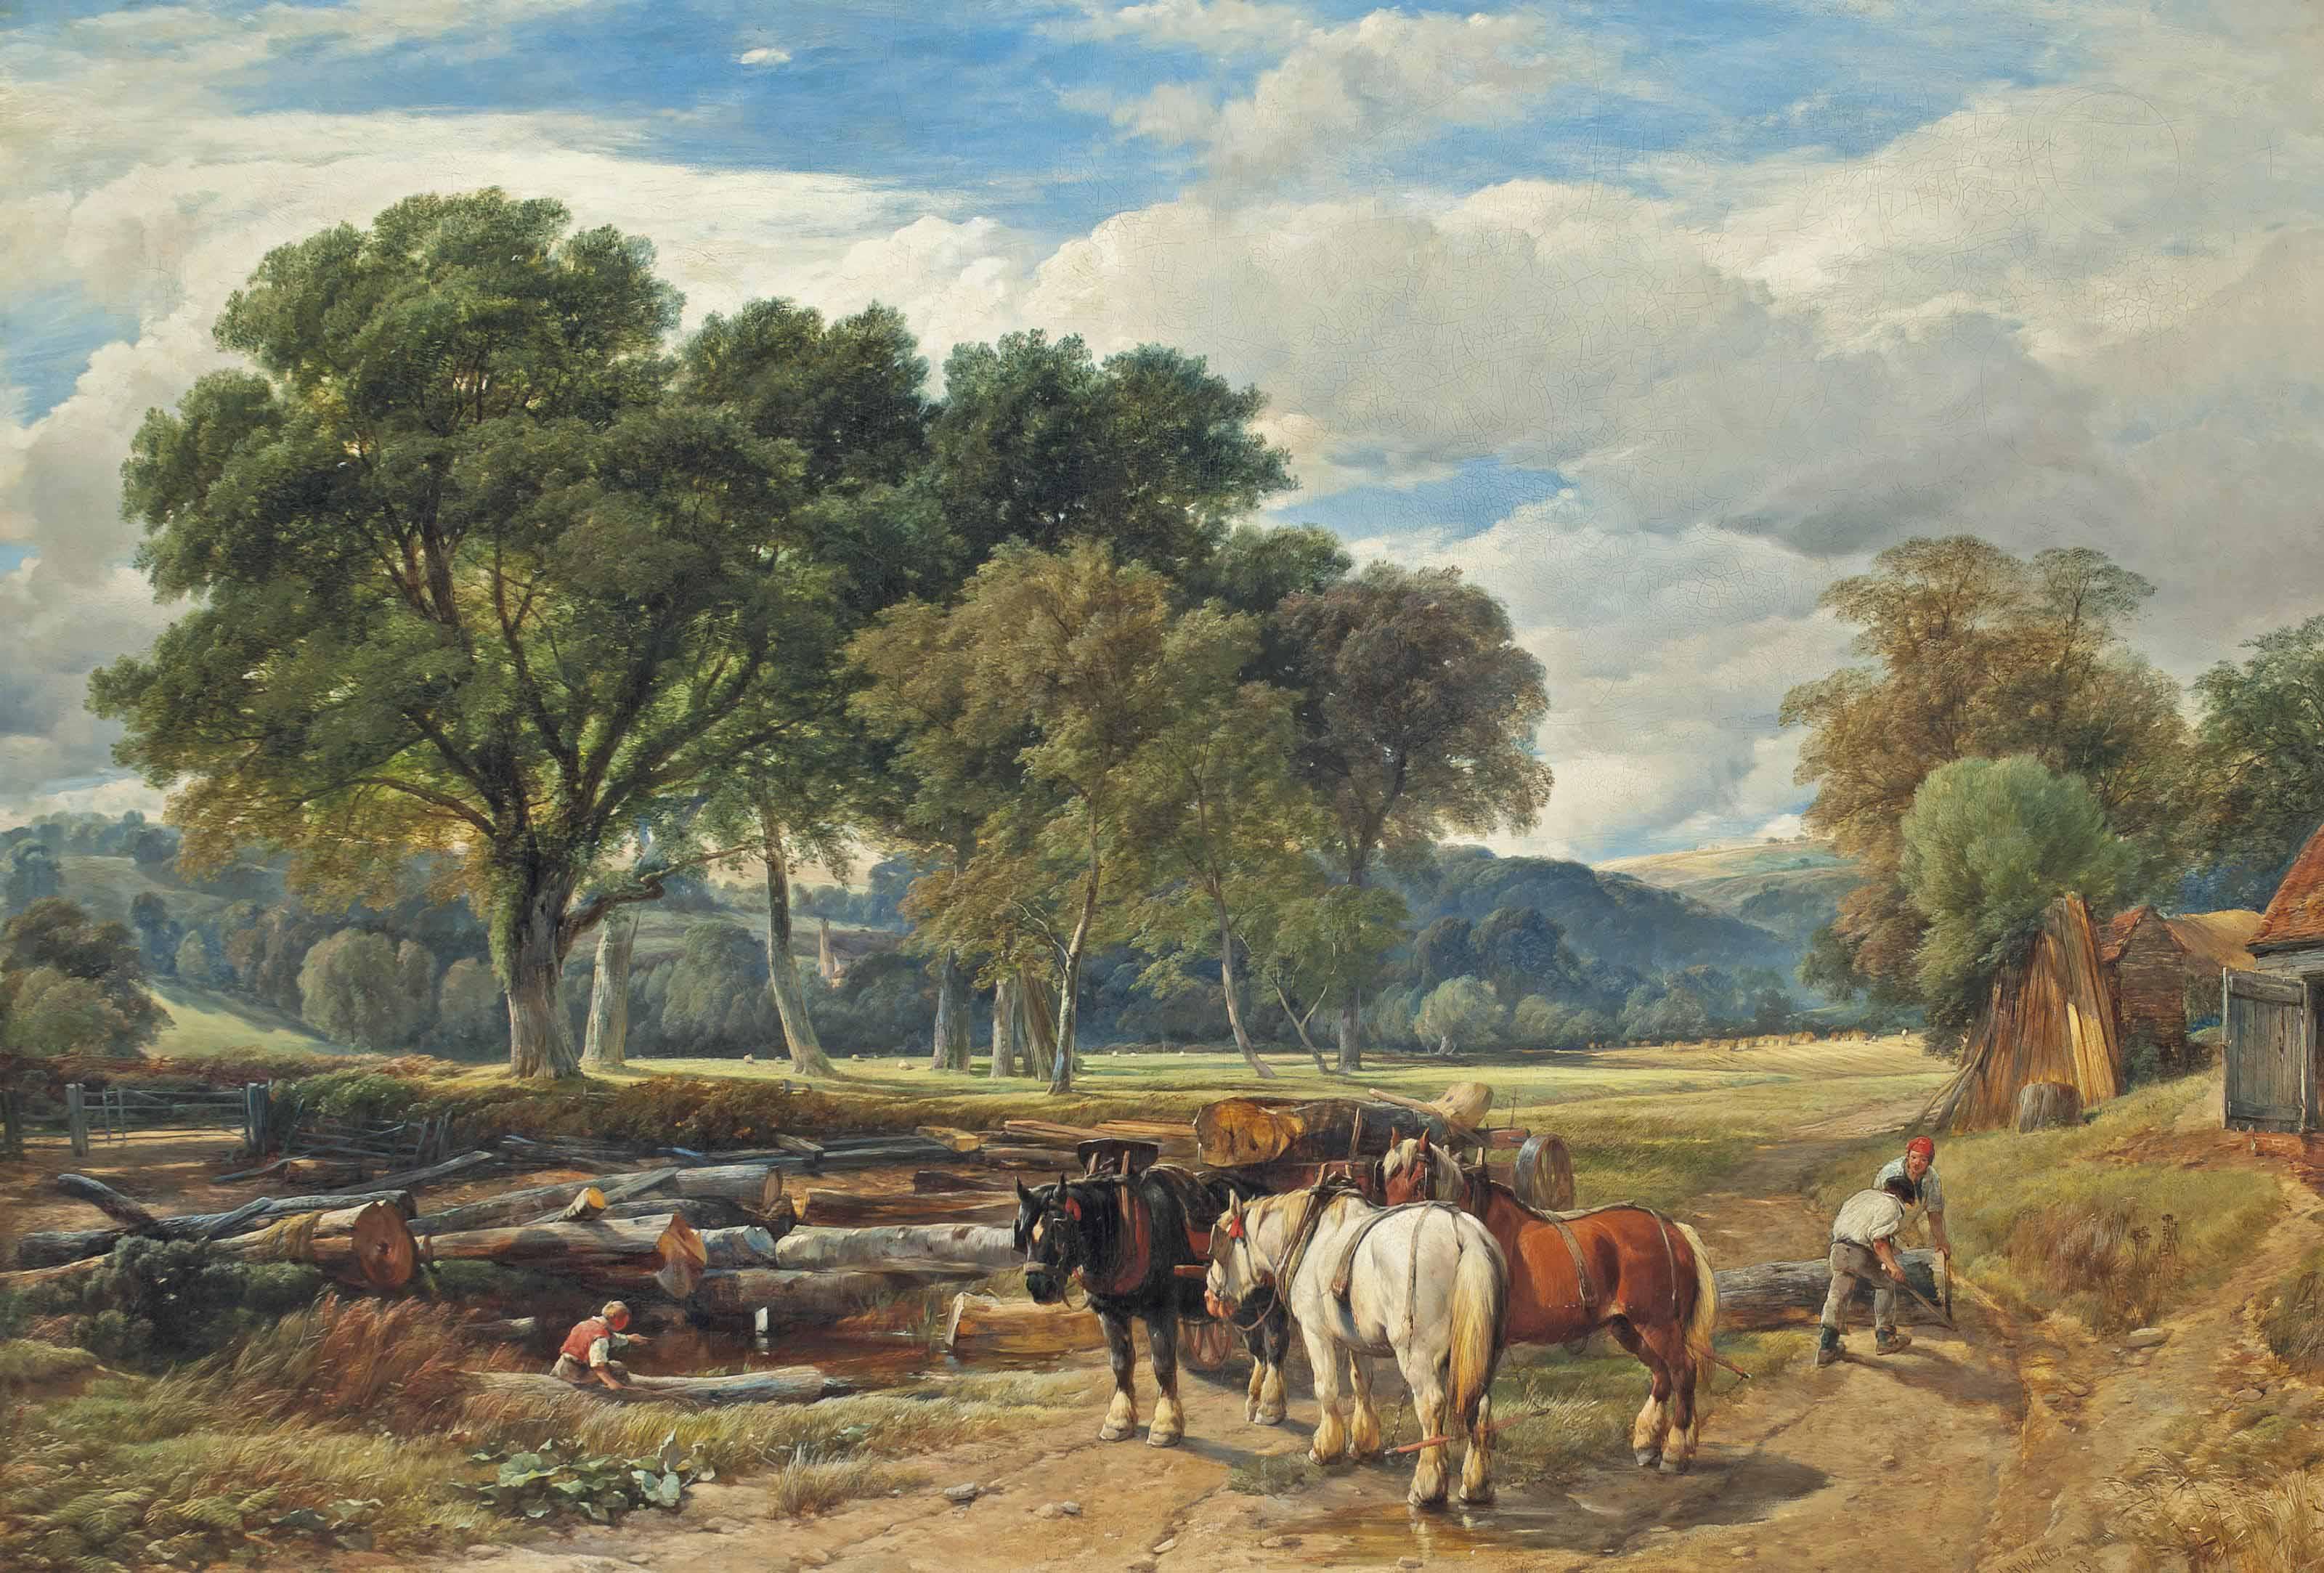 Loggers in an extensive summer landscape